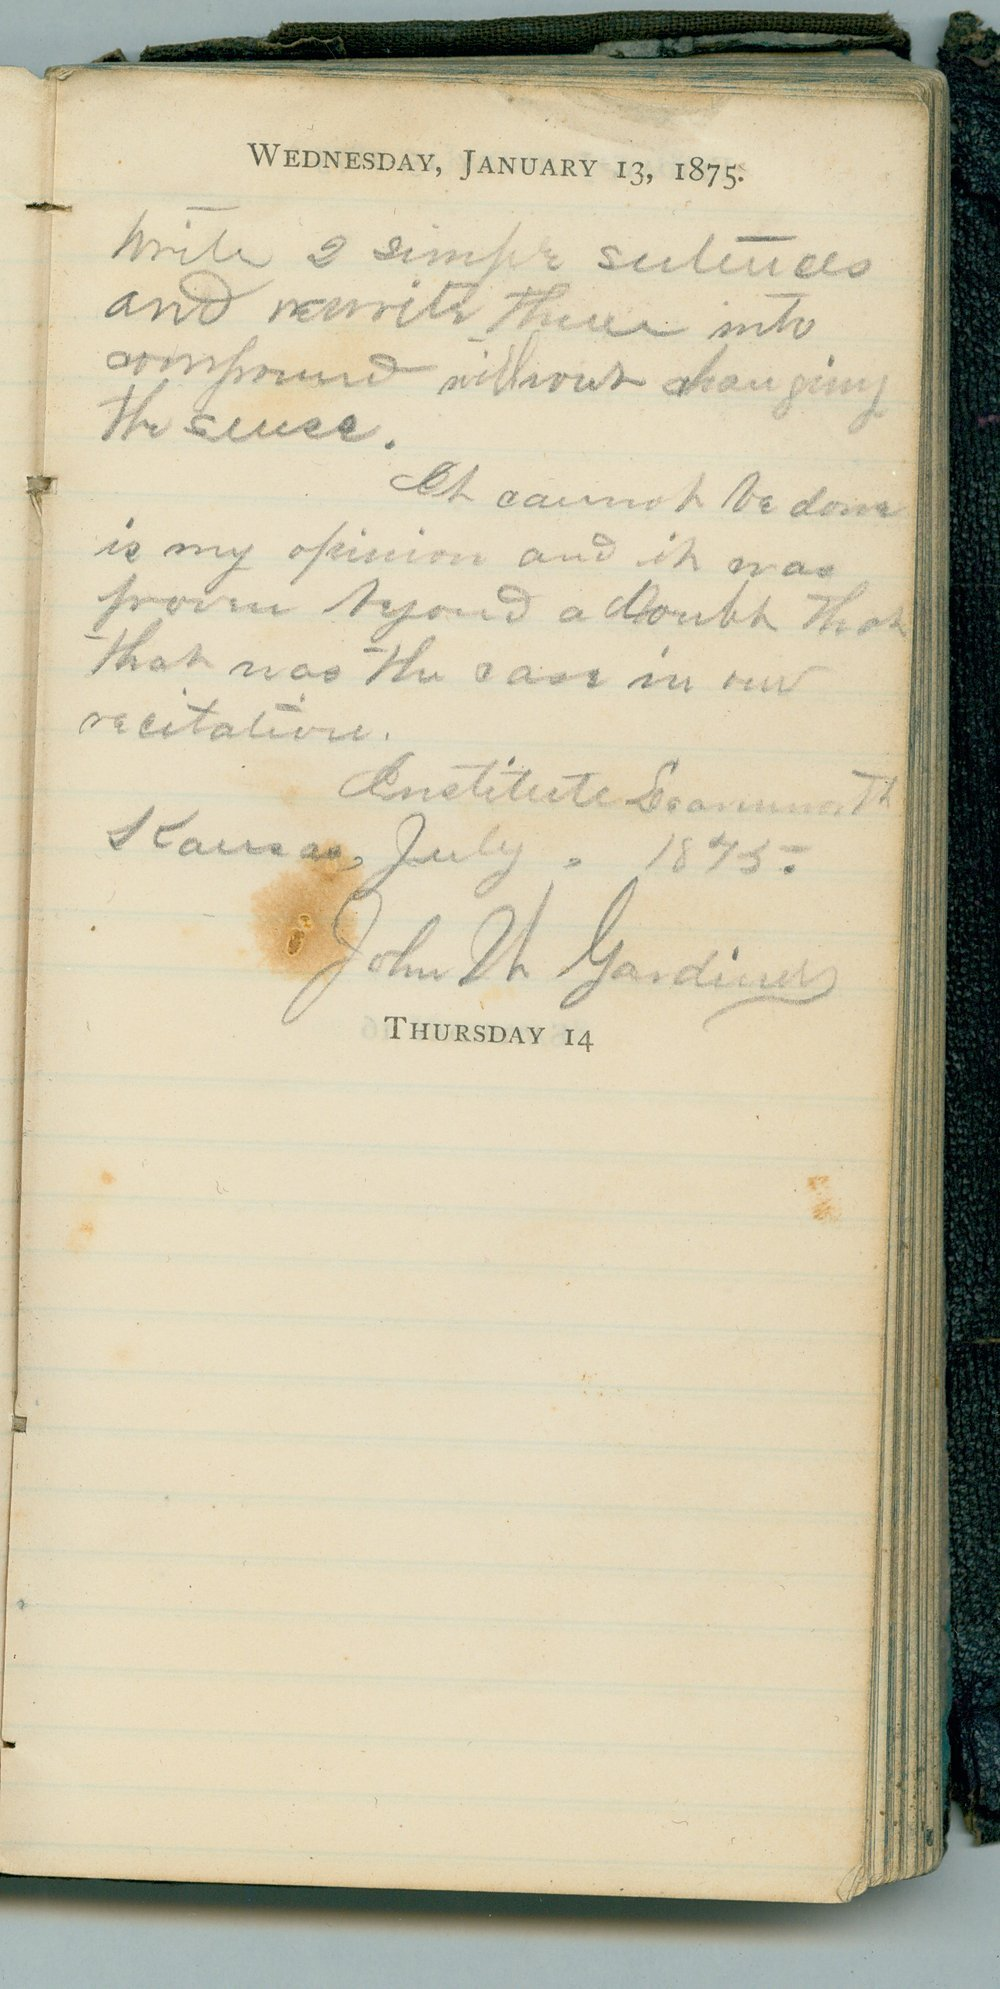 John William Gardiner diary - Jan 13, 1875